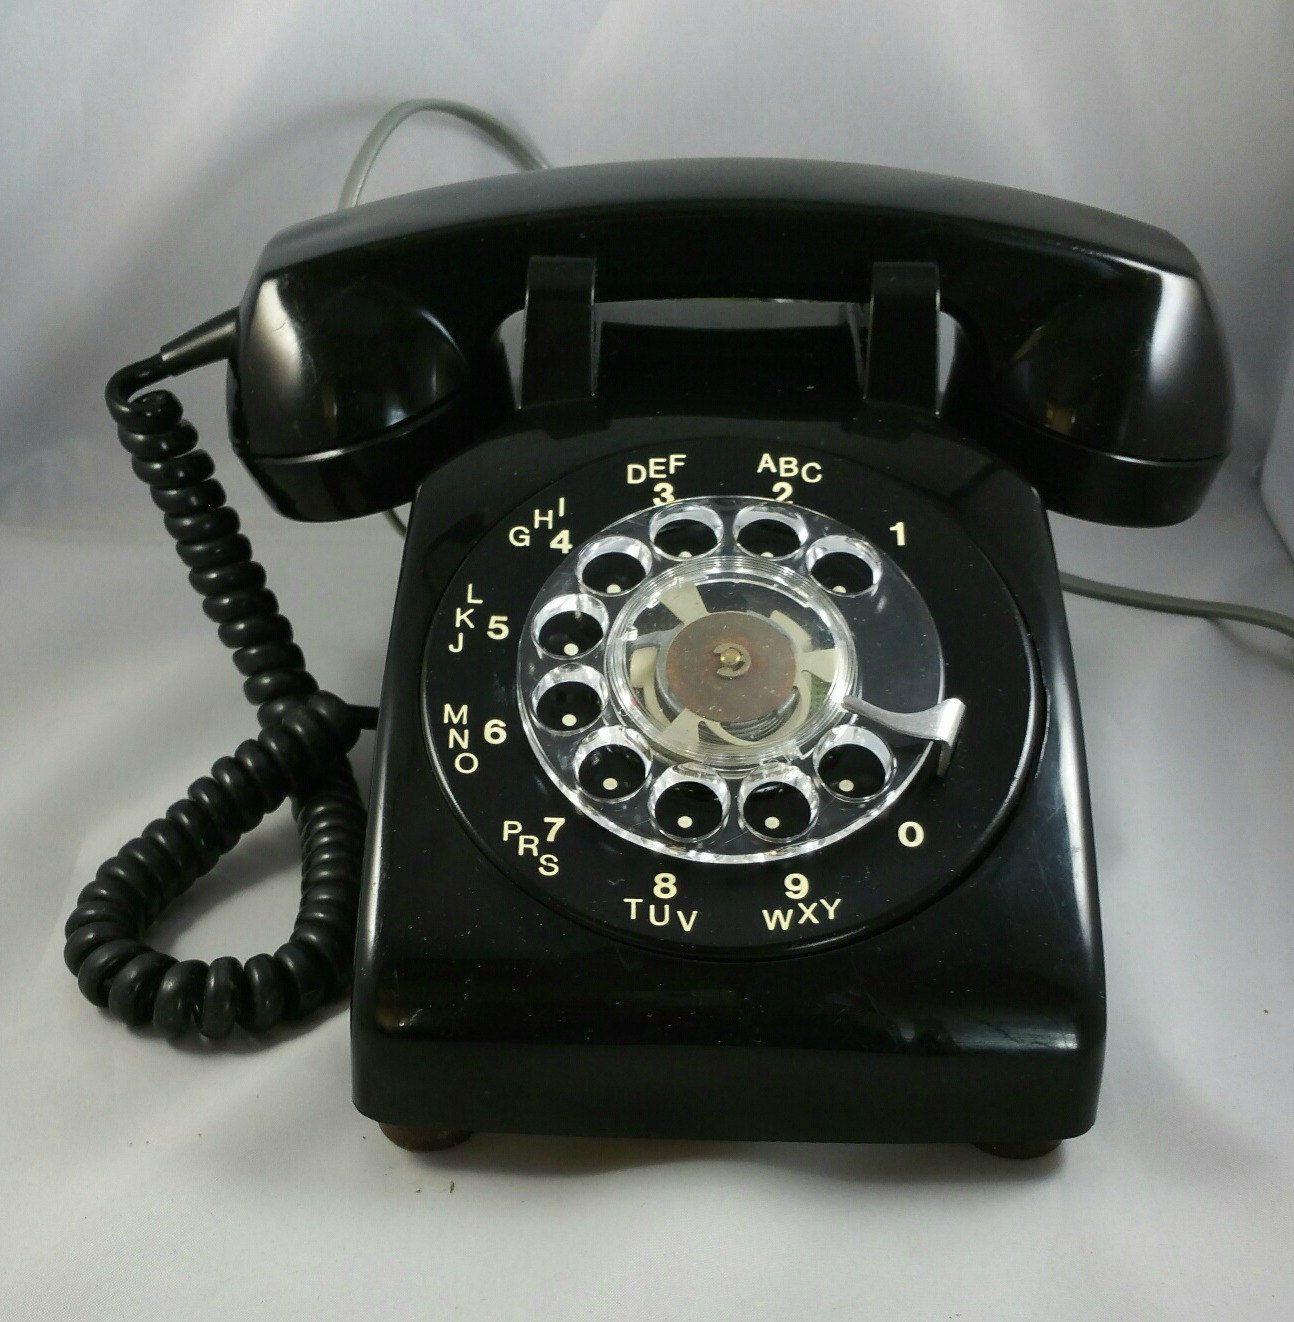 Vintage Rotary Phone Black Colored Desk Agt Dial